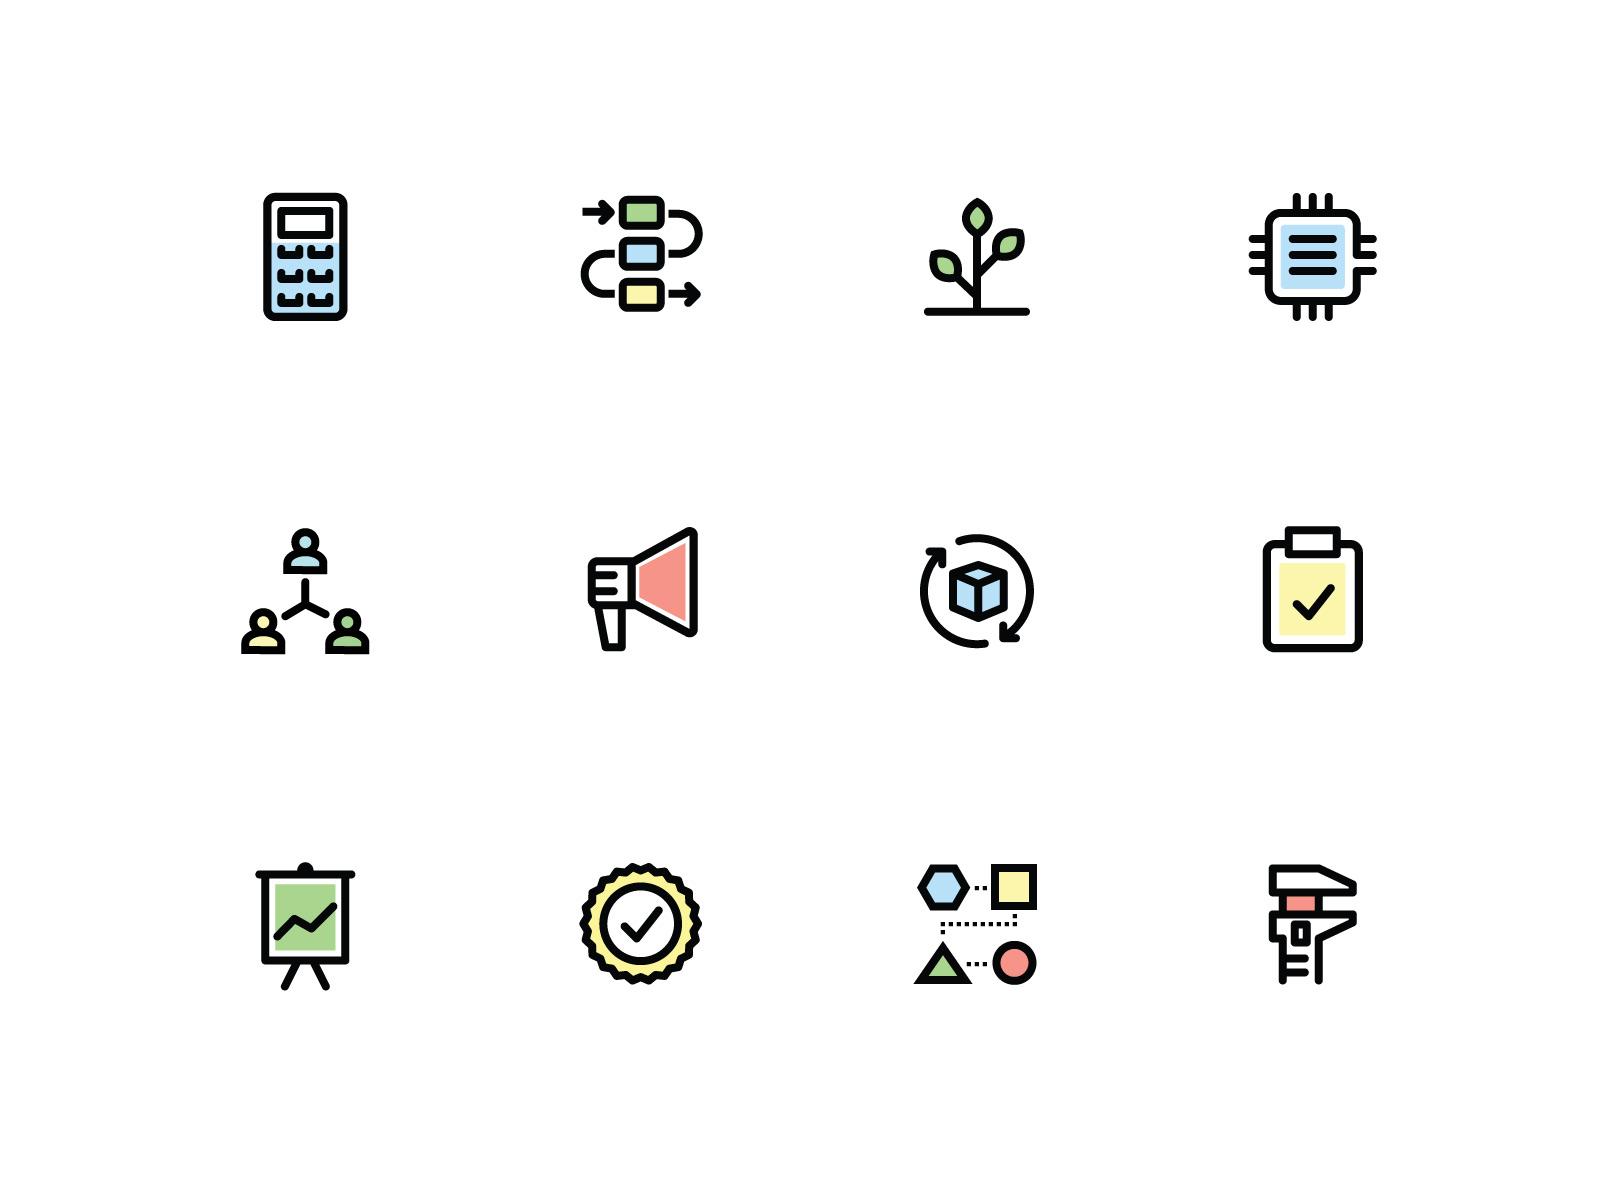 Product icon set